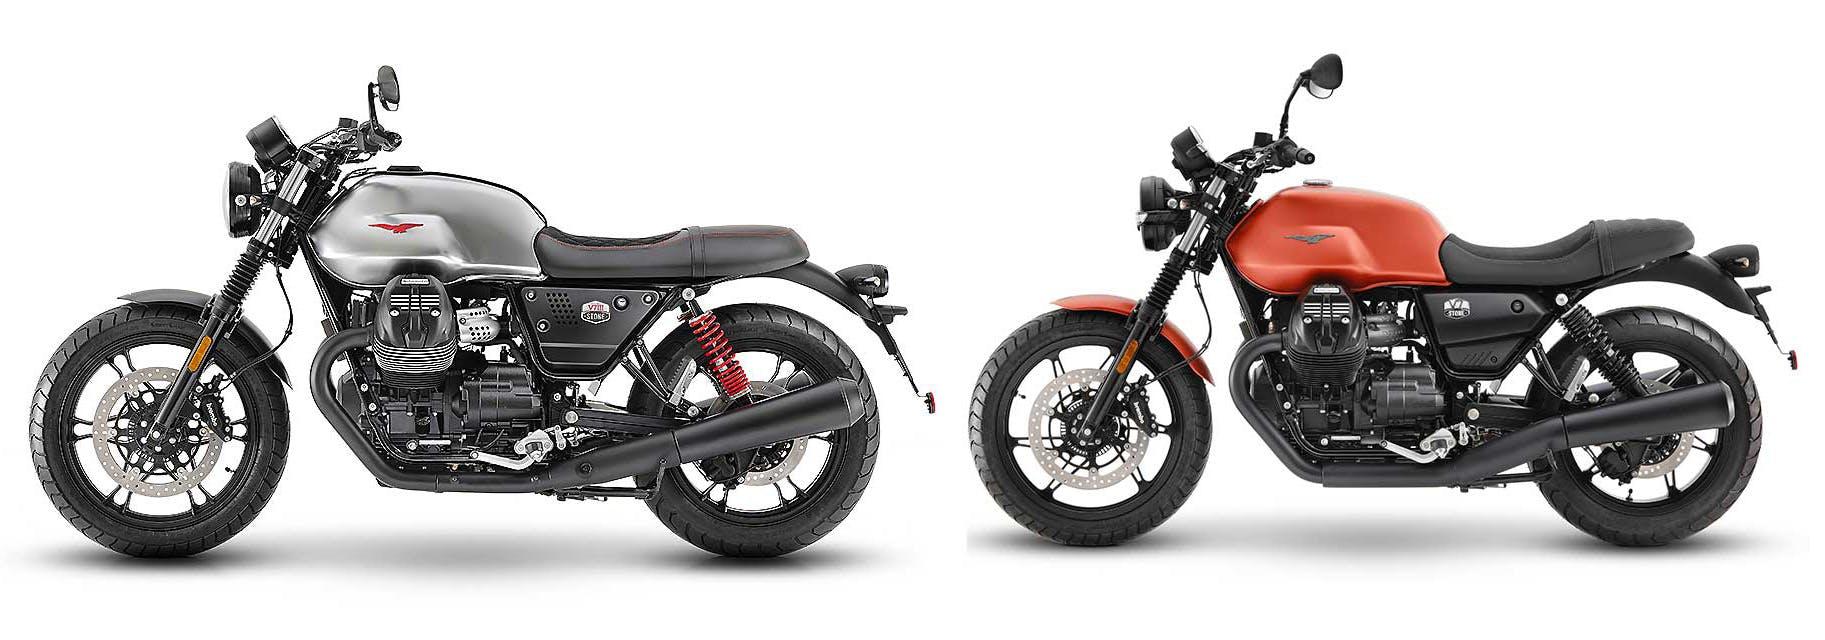 Moto Guzzi V7 2021 confronto con vecchia V7